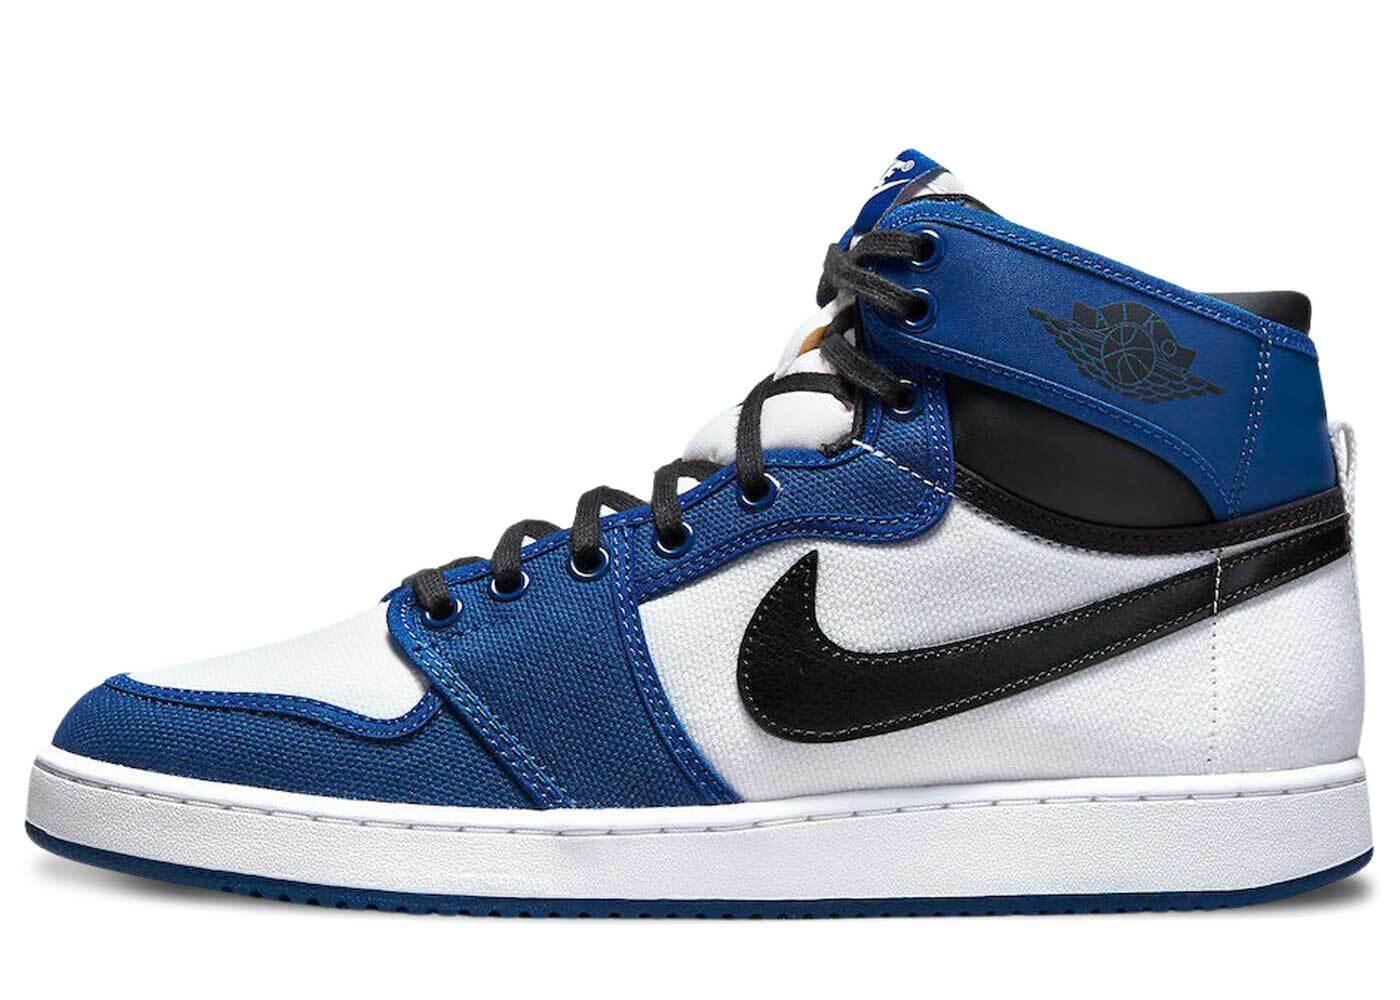 Nike Air Jordan 1 KO Storm Blueの写真